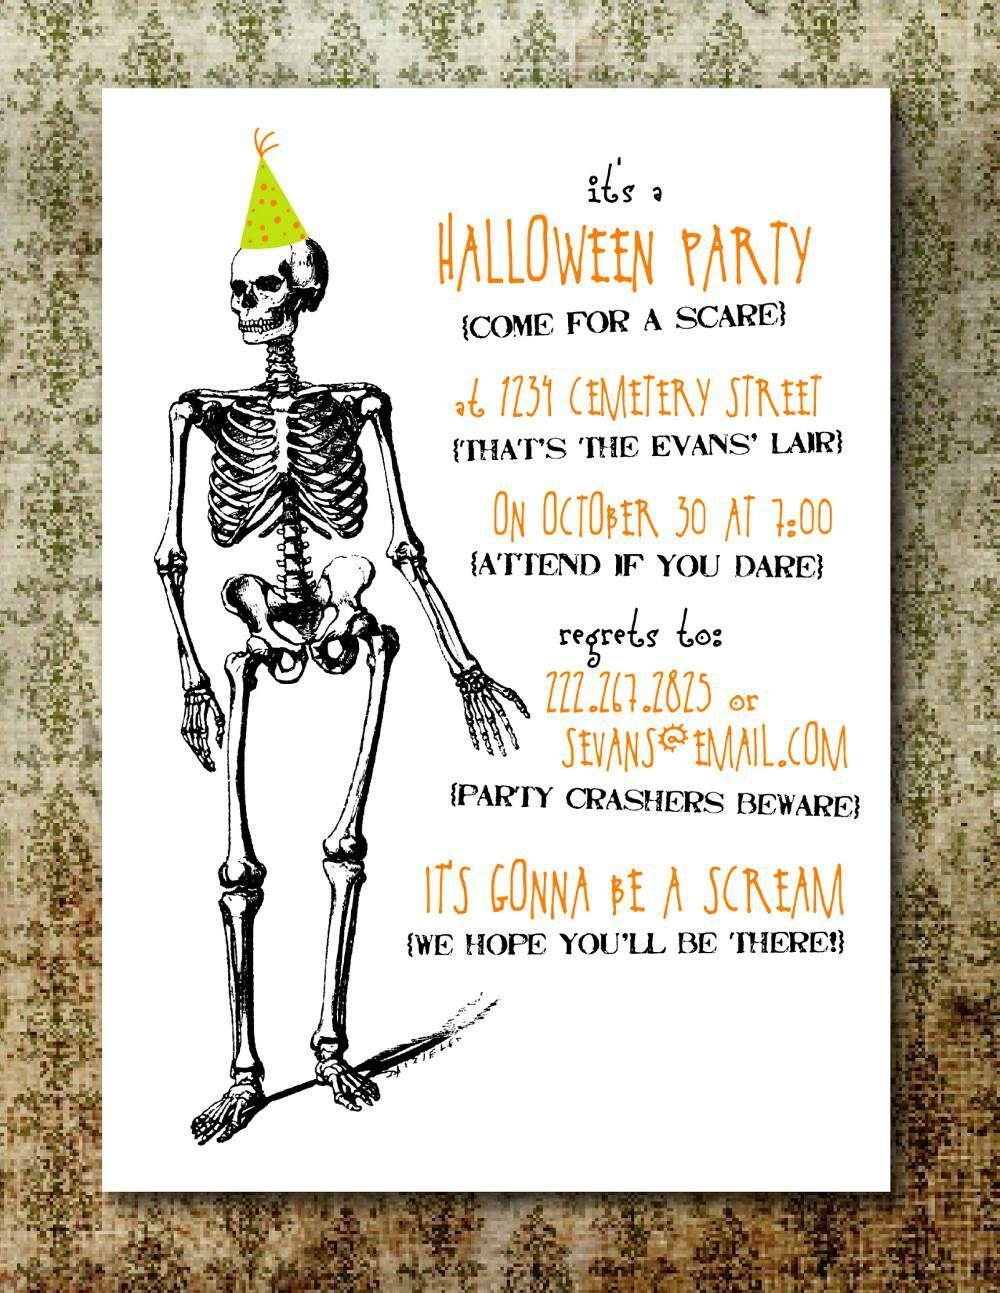 Free Printable Halloween Invitations For Adults I Free Halloween Party Invitations Halloween Birthday Party Invitations Printable Halloween Party Invitations